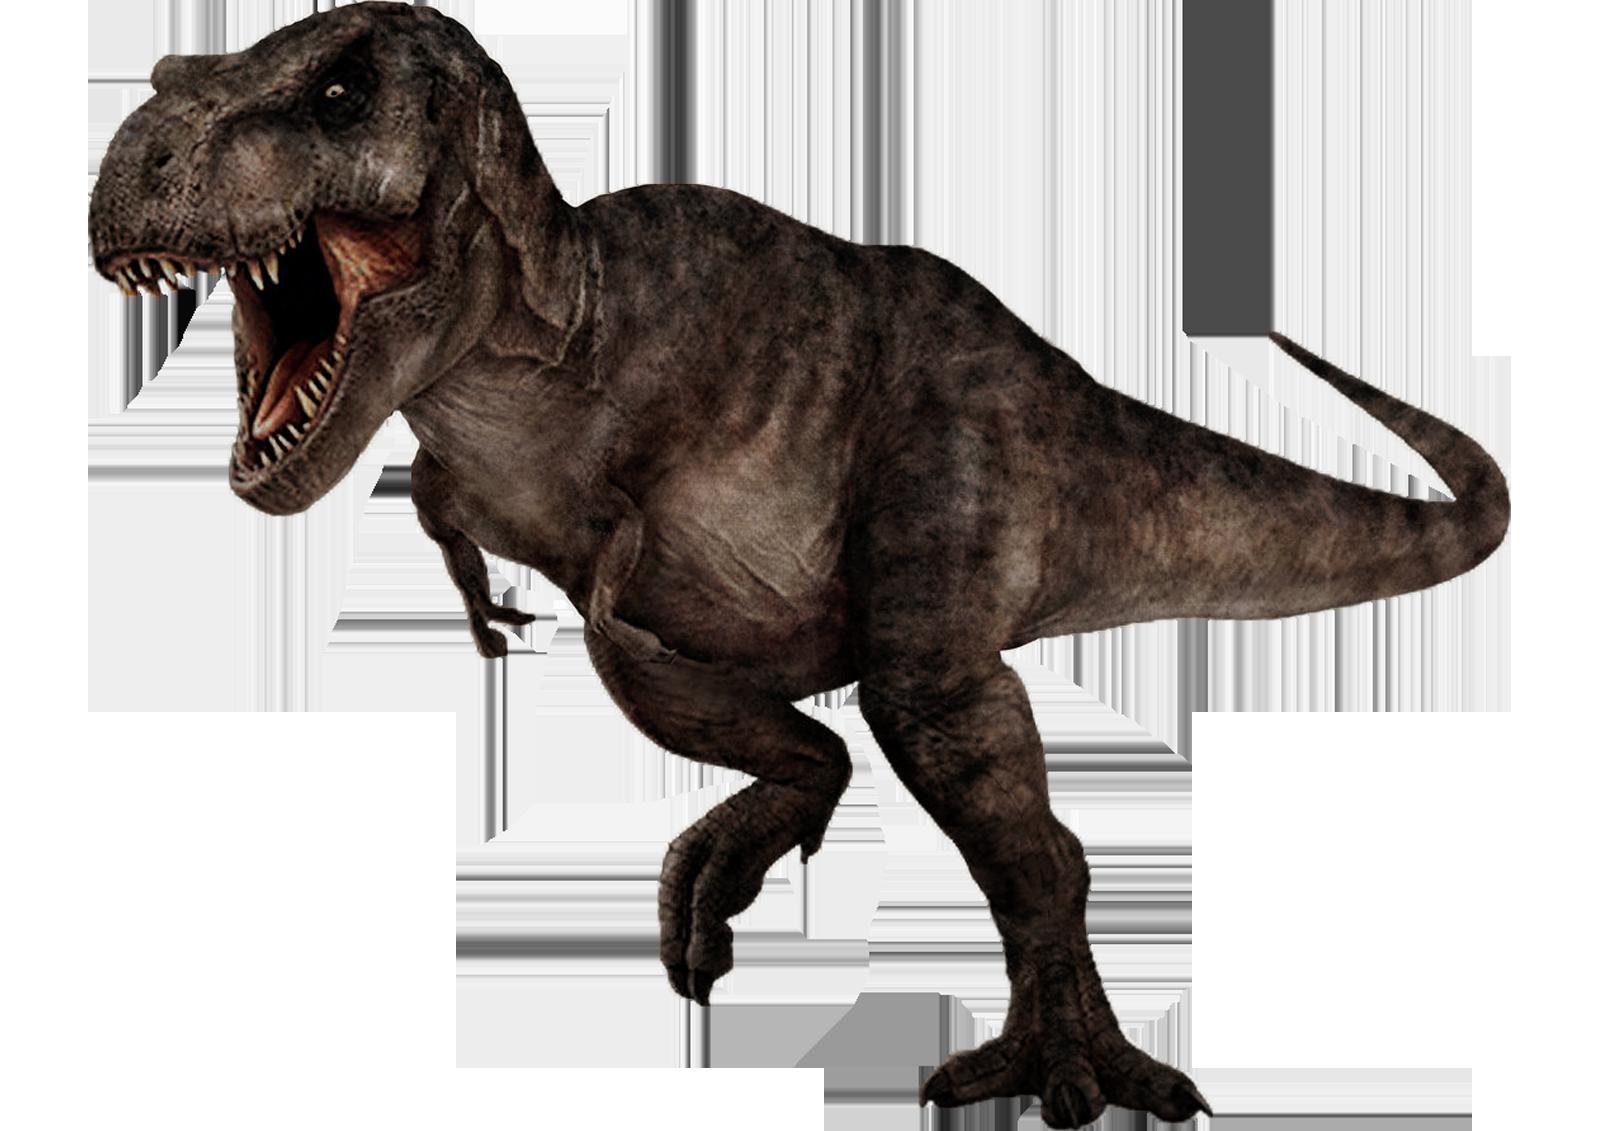 Tyrannosaurus rex 2 by darbarrrr on deviantart for Tyranosaurus rex